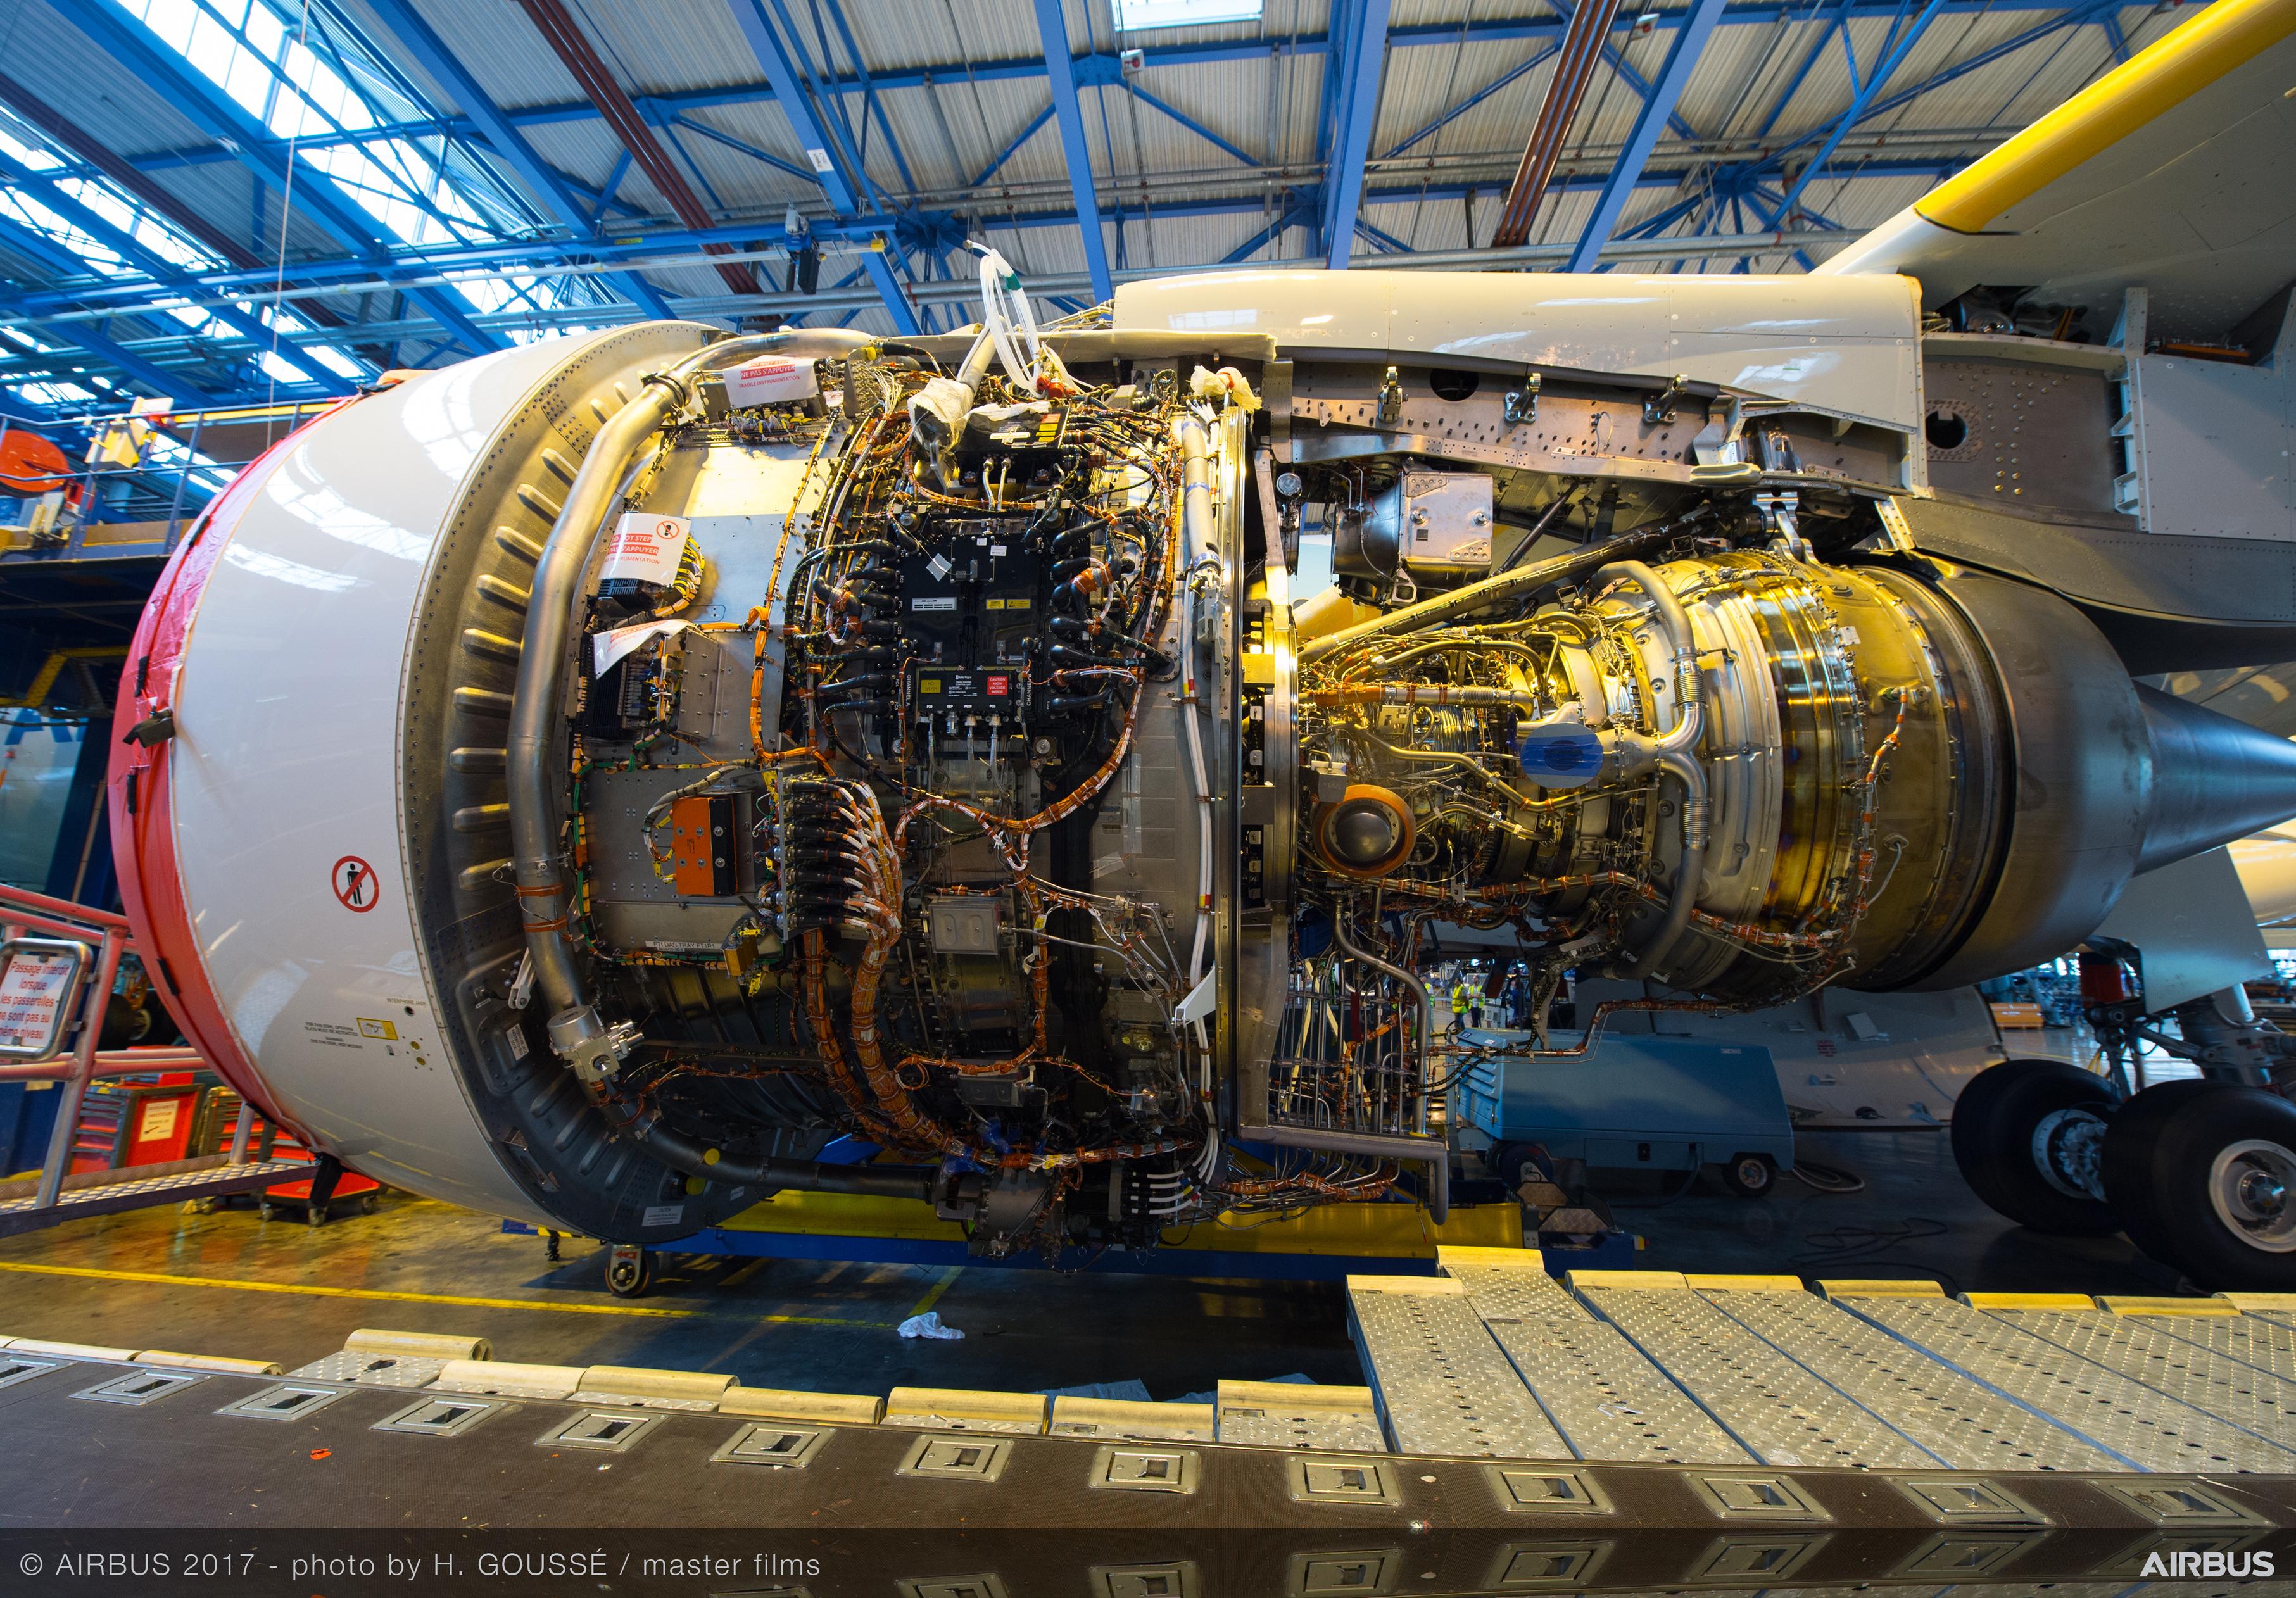 Rolls-Royce Trent 7000 [3626 x 2524]